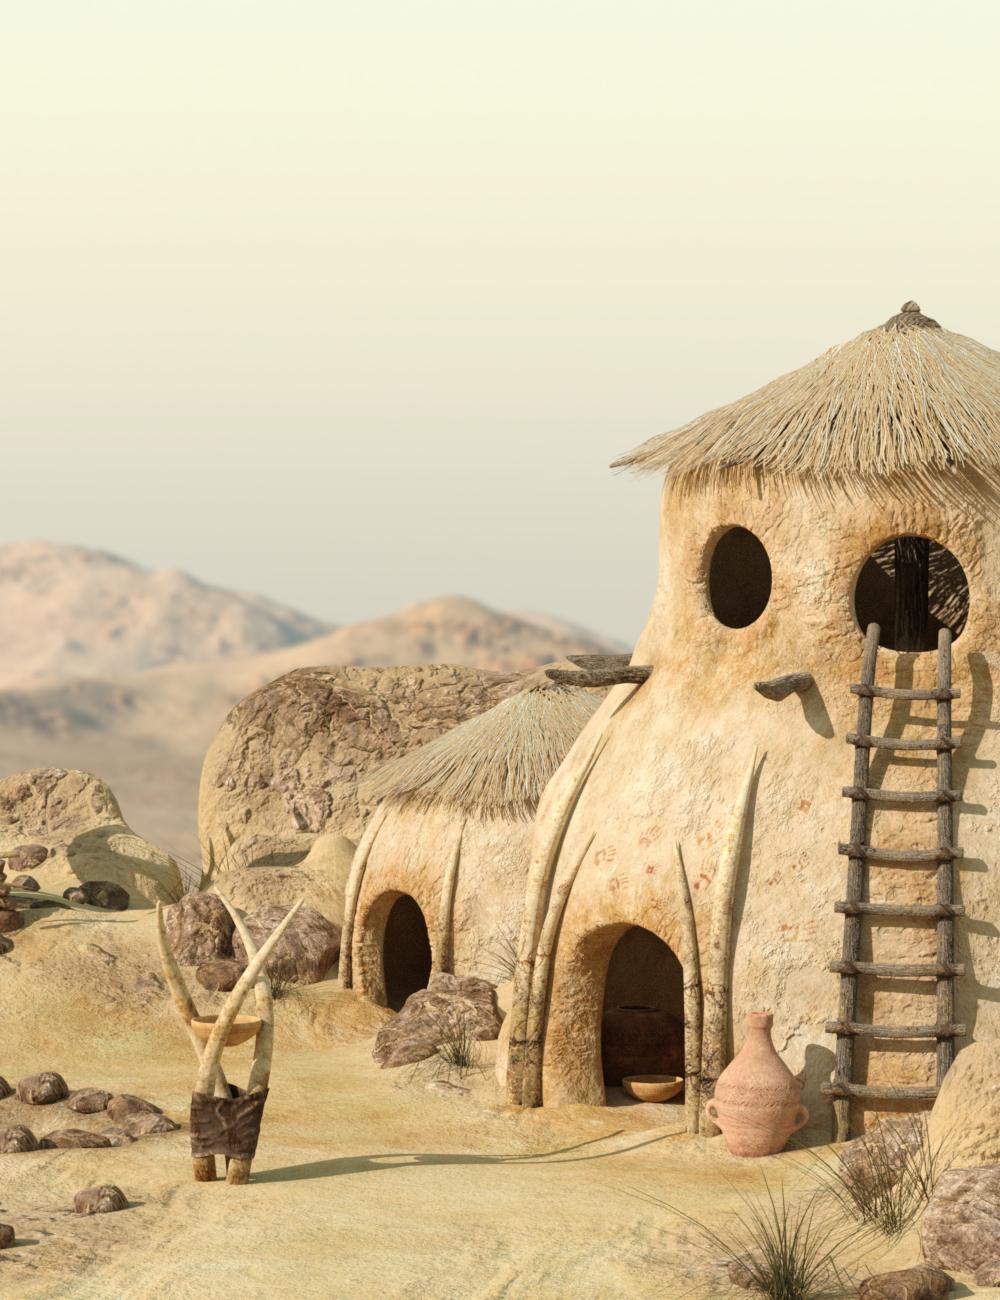 v176 Desert Tribe Hut by: vikike176, 3D Models by Daz 3D